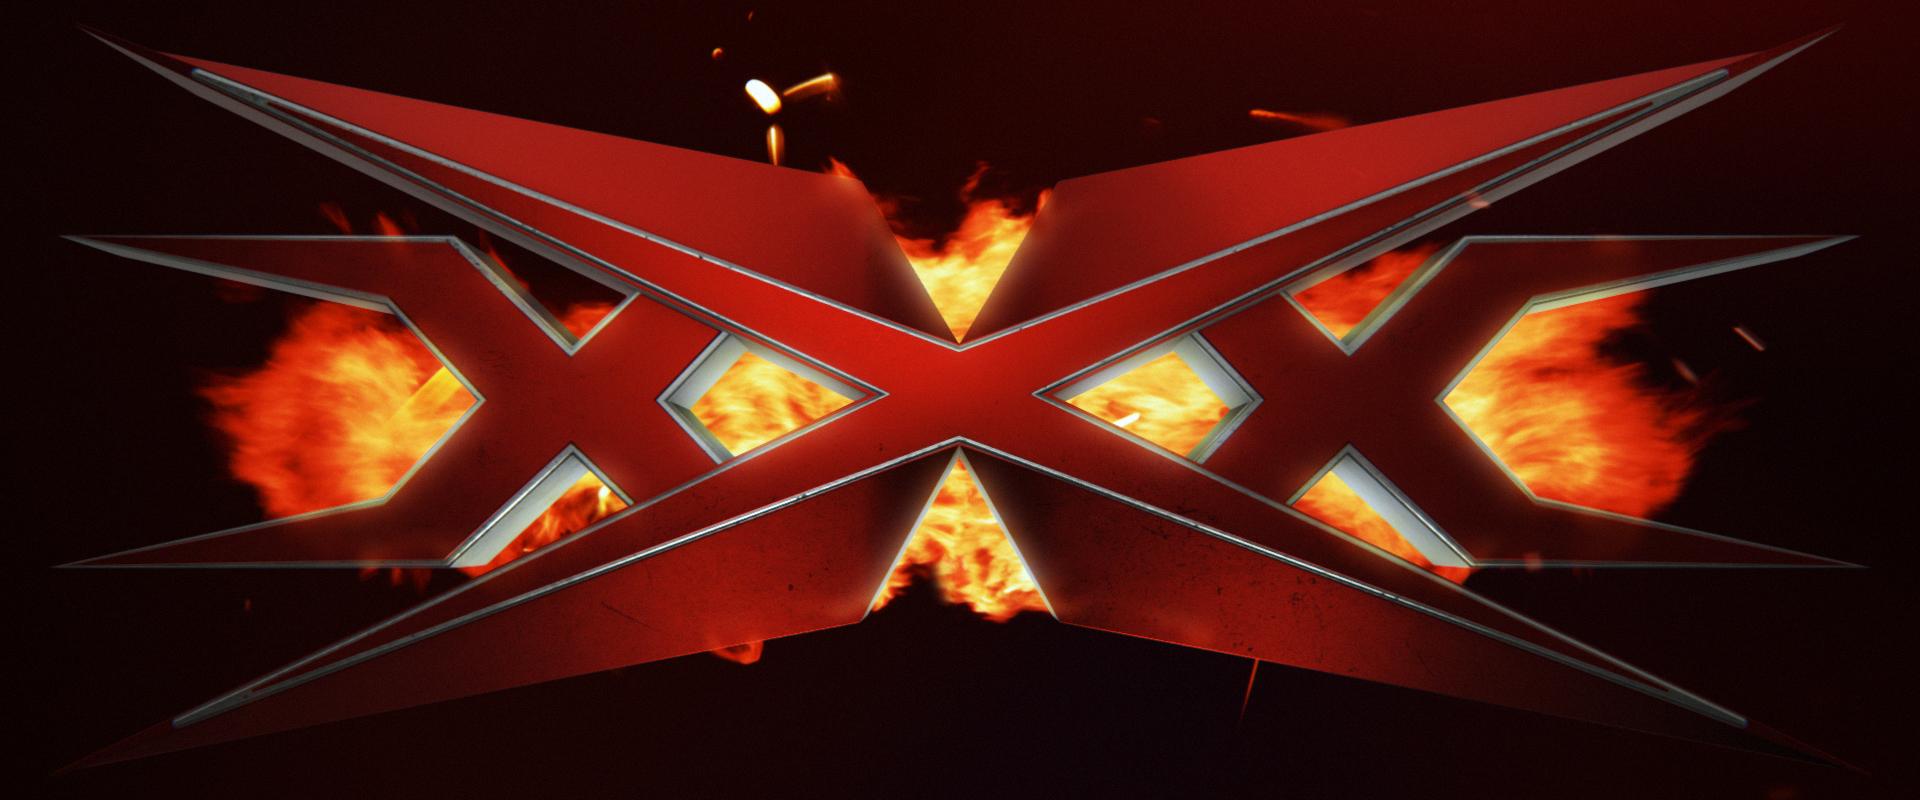 xXx3_001_MT_2.40_07_v01_BS.jpg